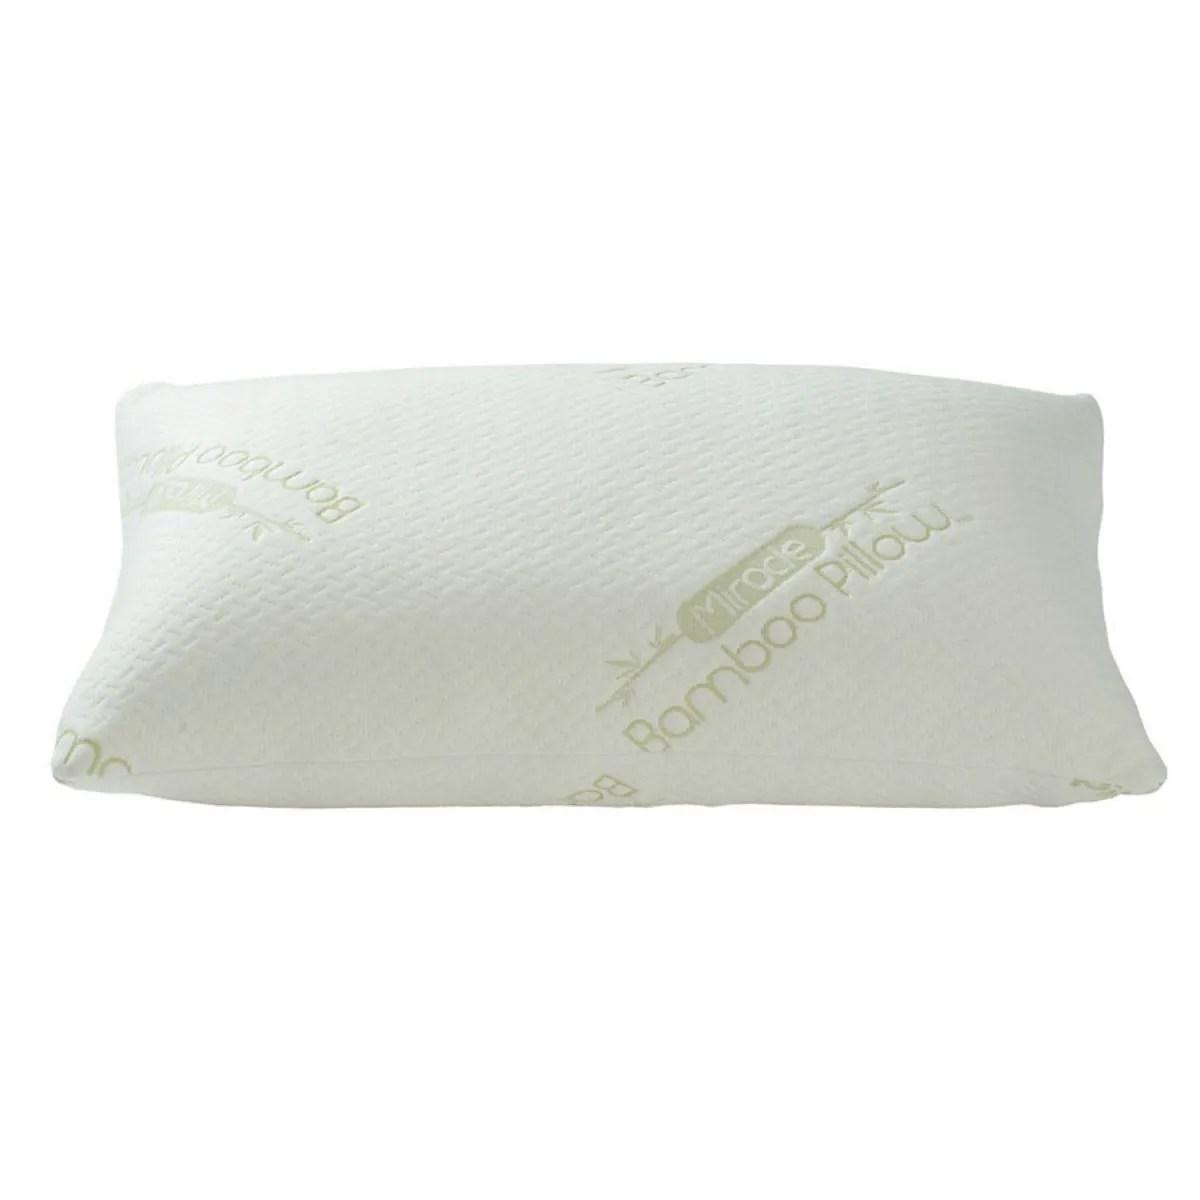 thane miracle bamboo pillow